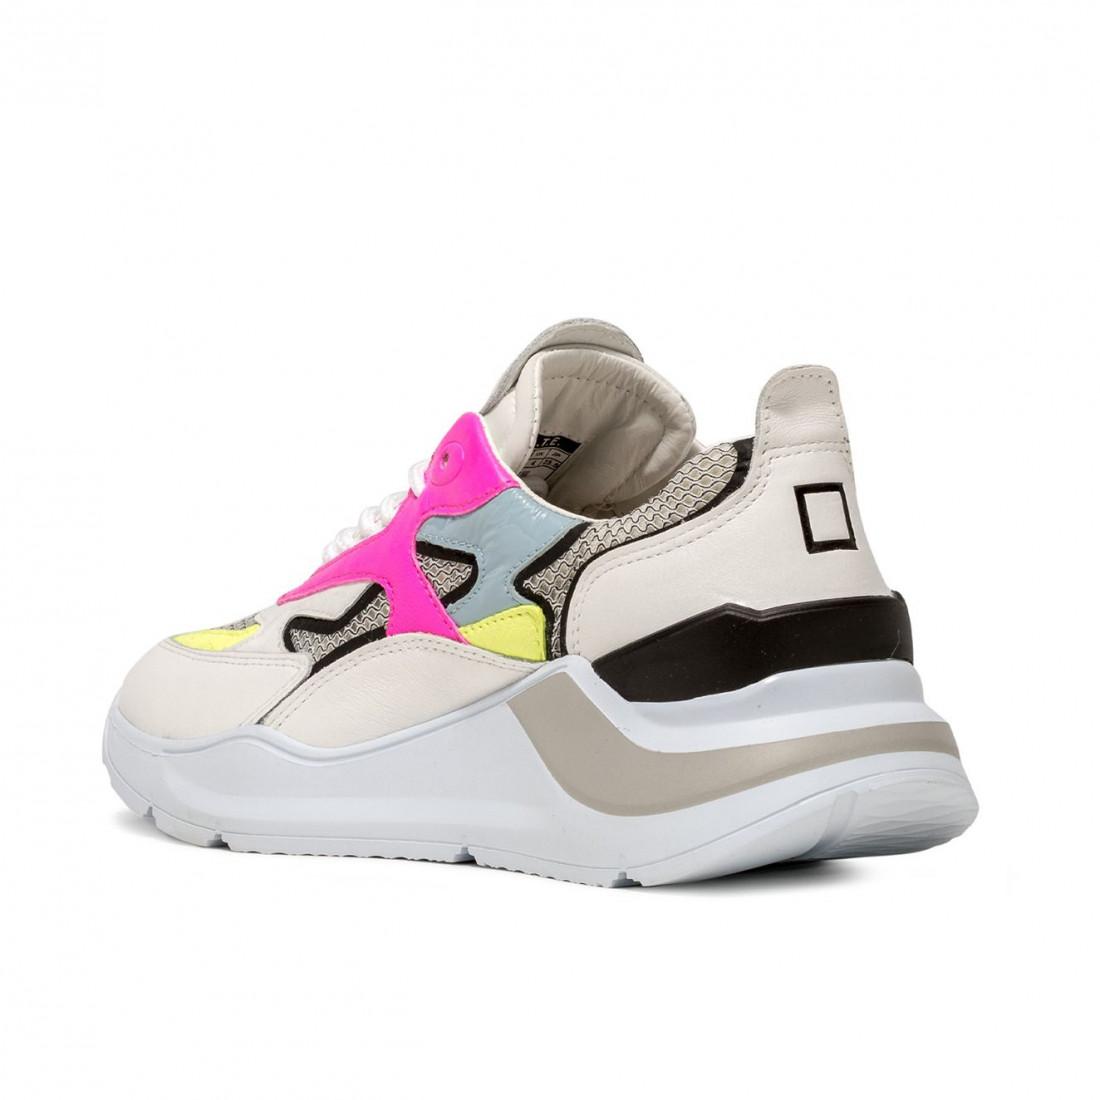 sneakers woman date fuga w341 fg fl wb 8453